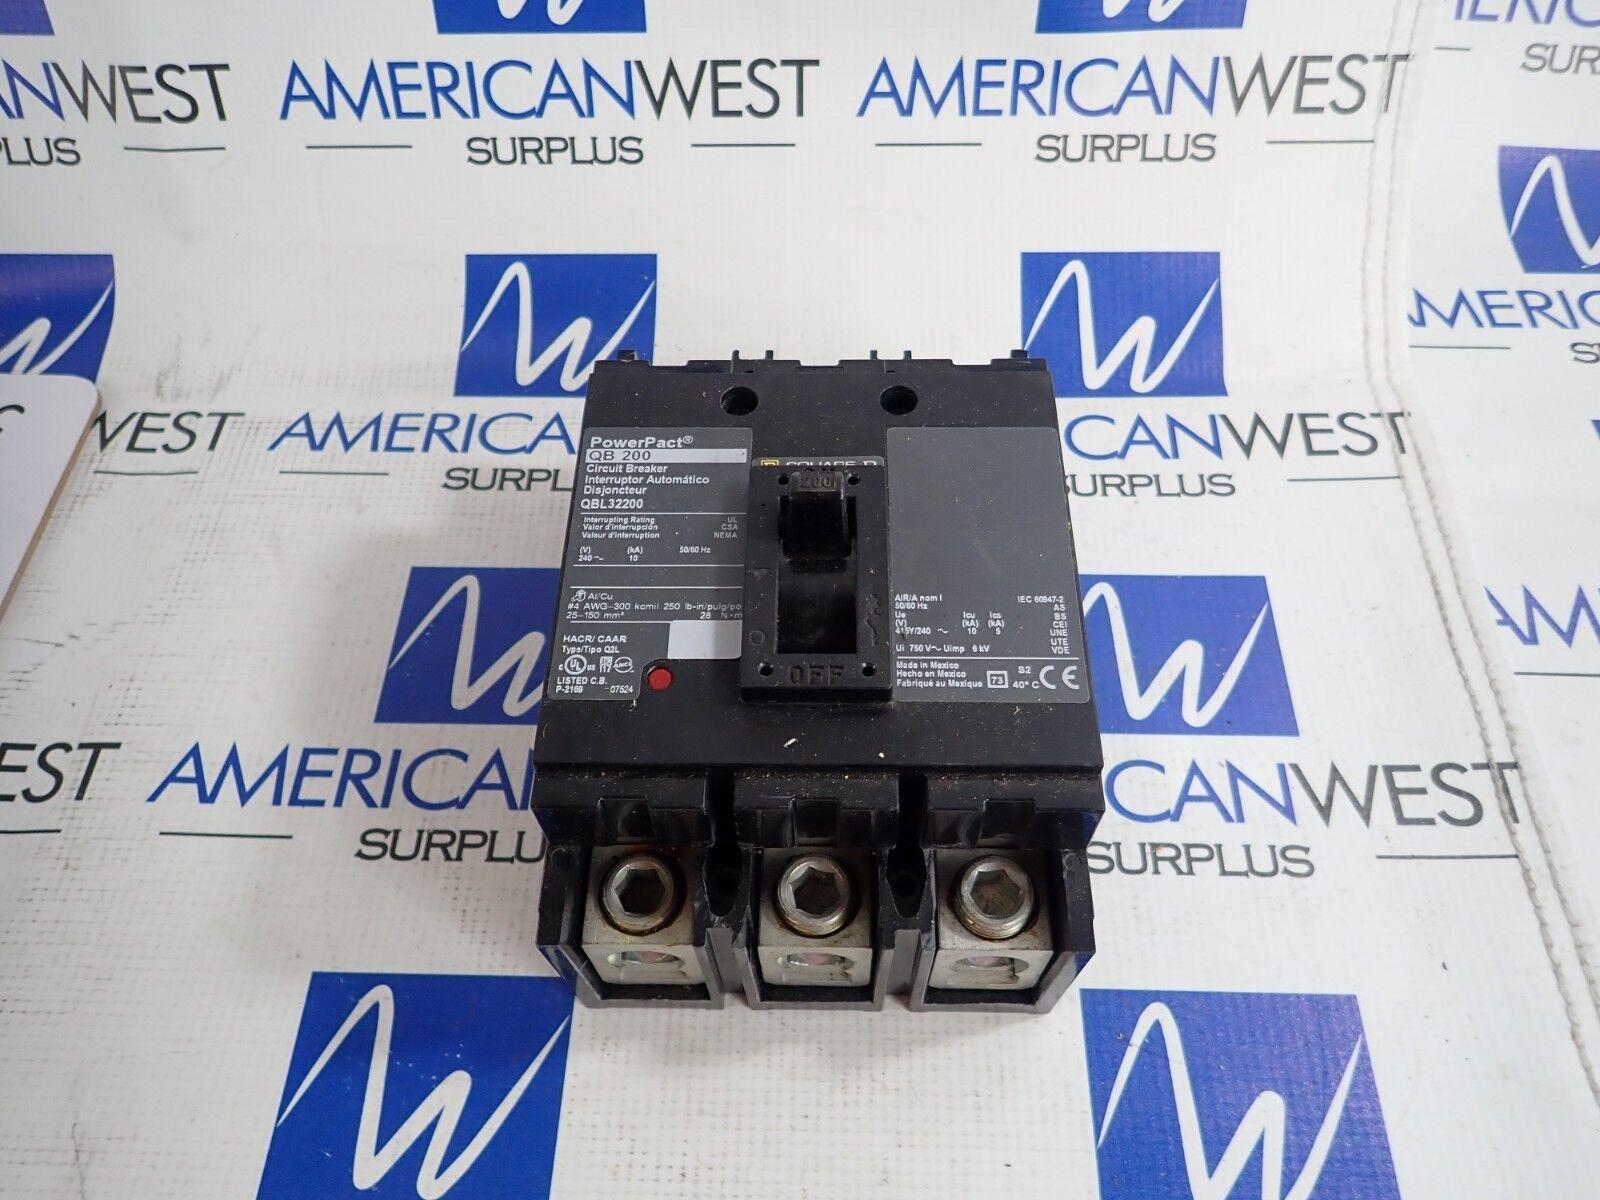 QBL32200 SQUARE SQUARE SQUARE D 3 Polo 200 Amp 240 voltios de alimentación a través de powerpact interruptor de circuito 057d3b